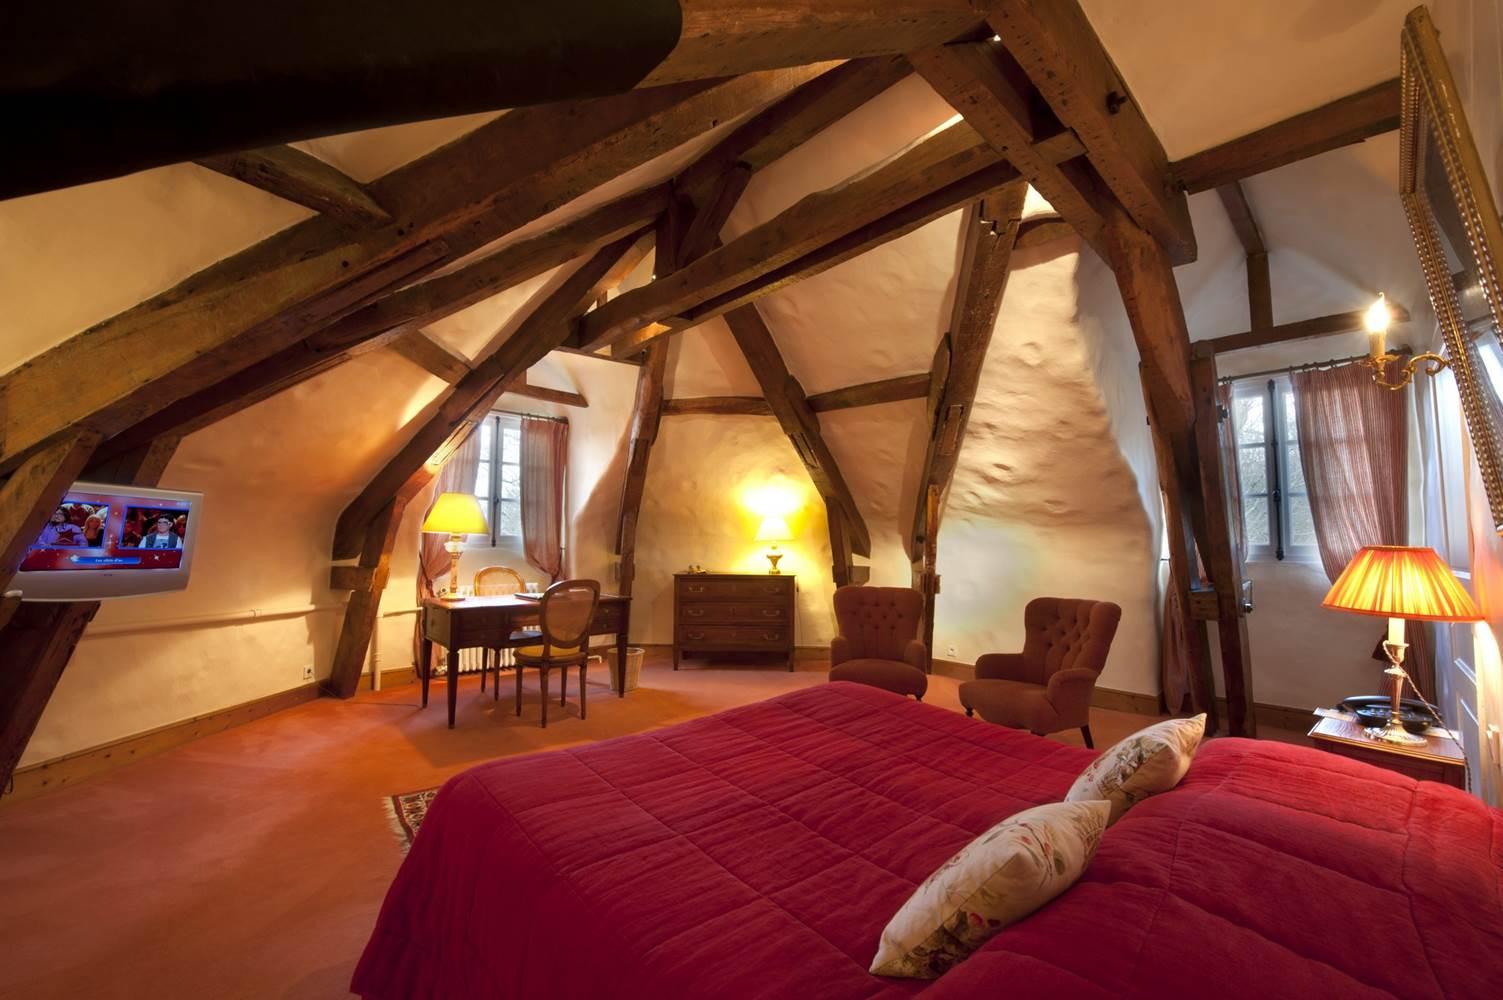 Hotel chateau locguénolé - kervignac - morbihan bretagne sud ©